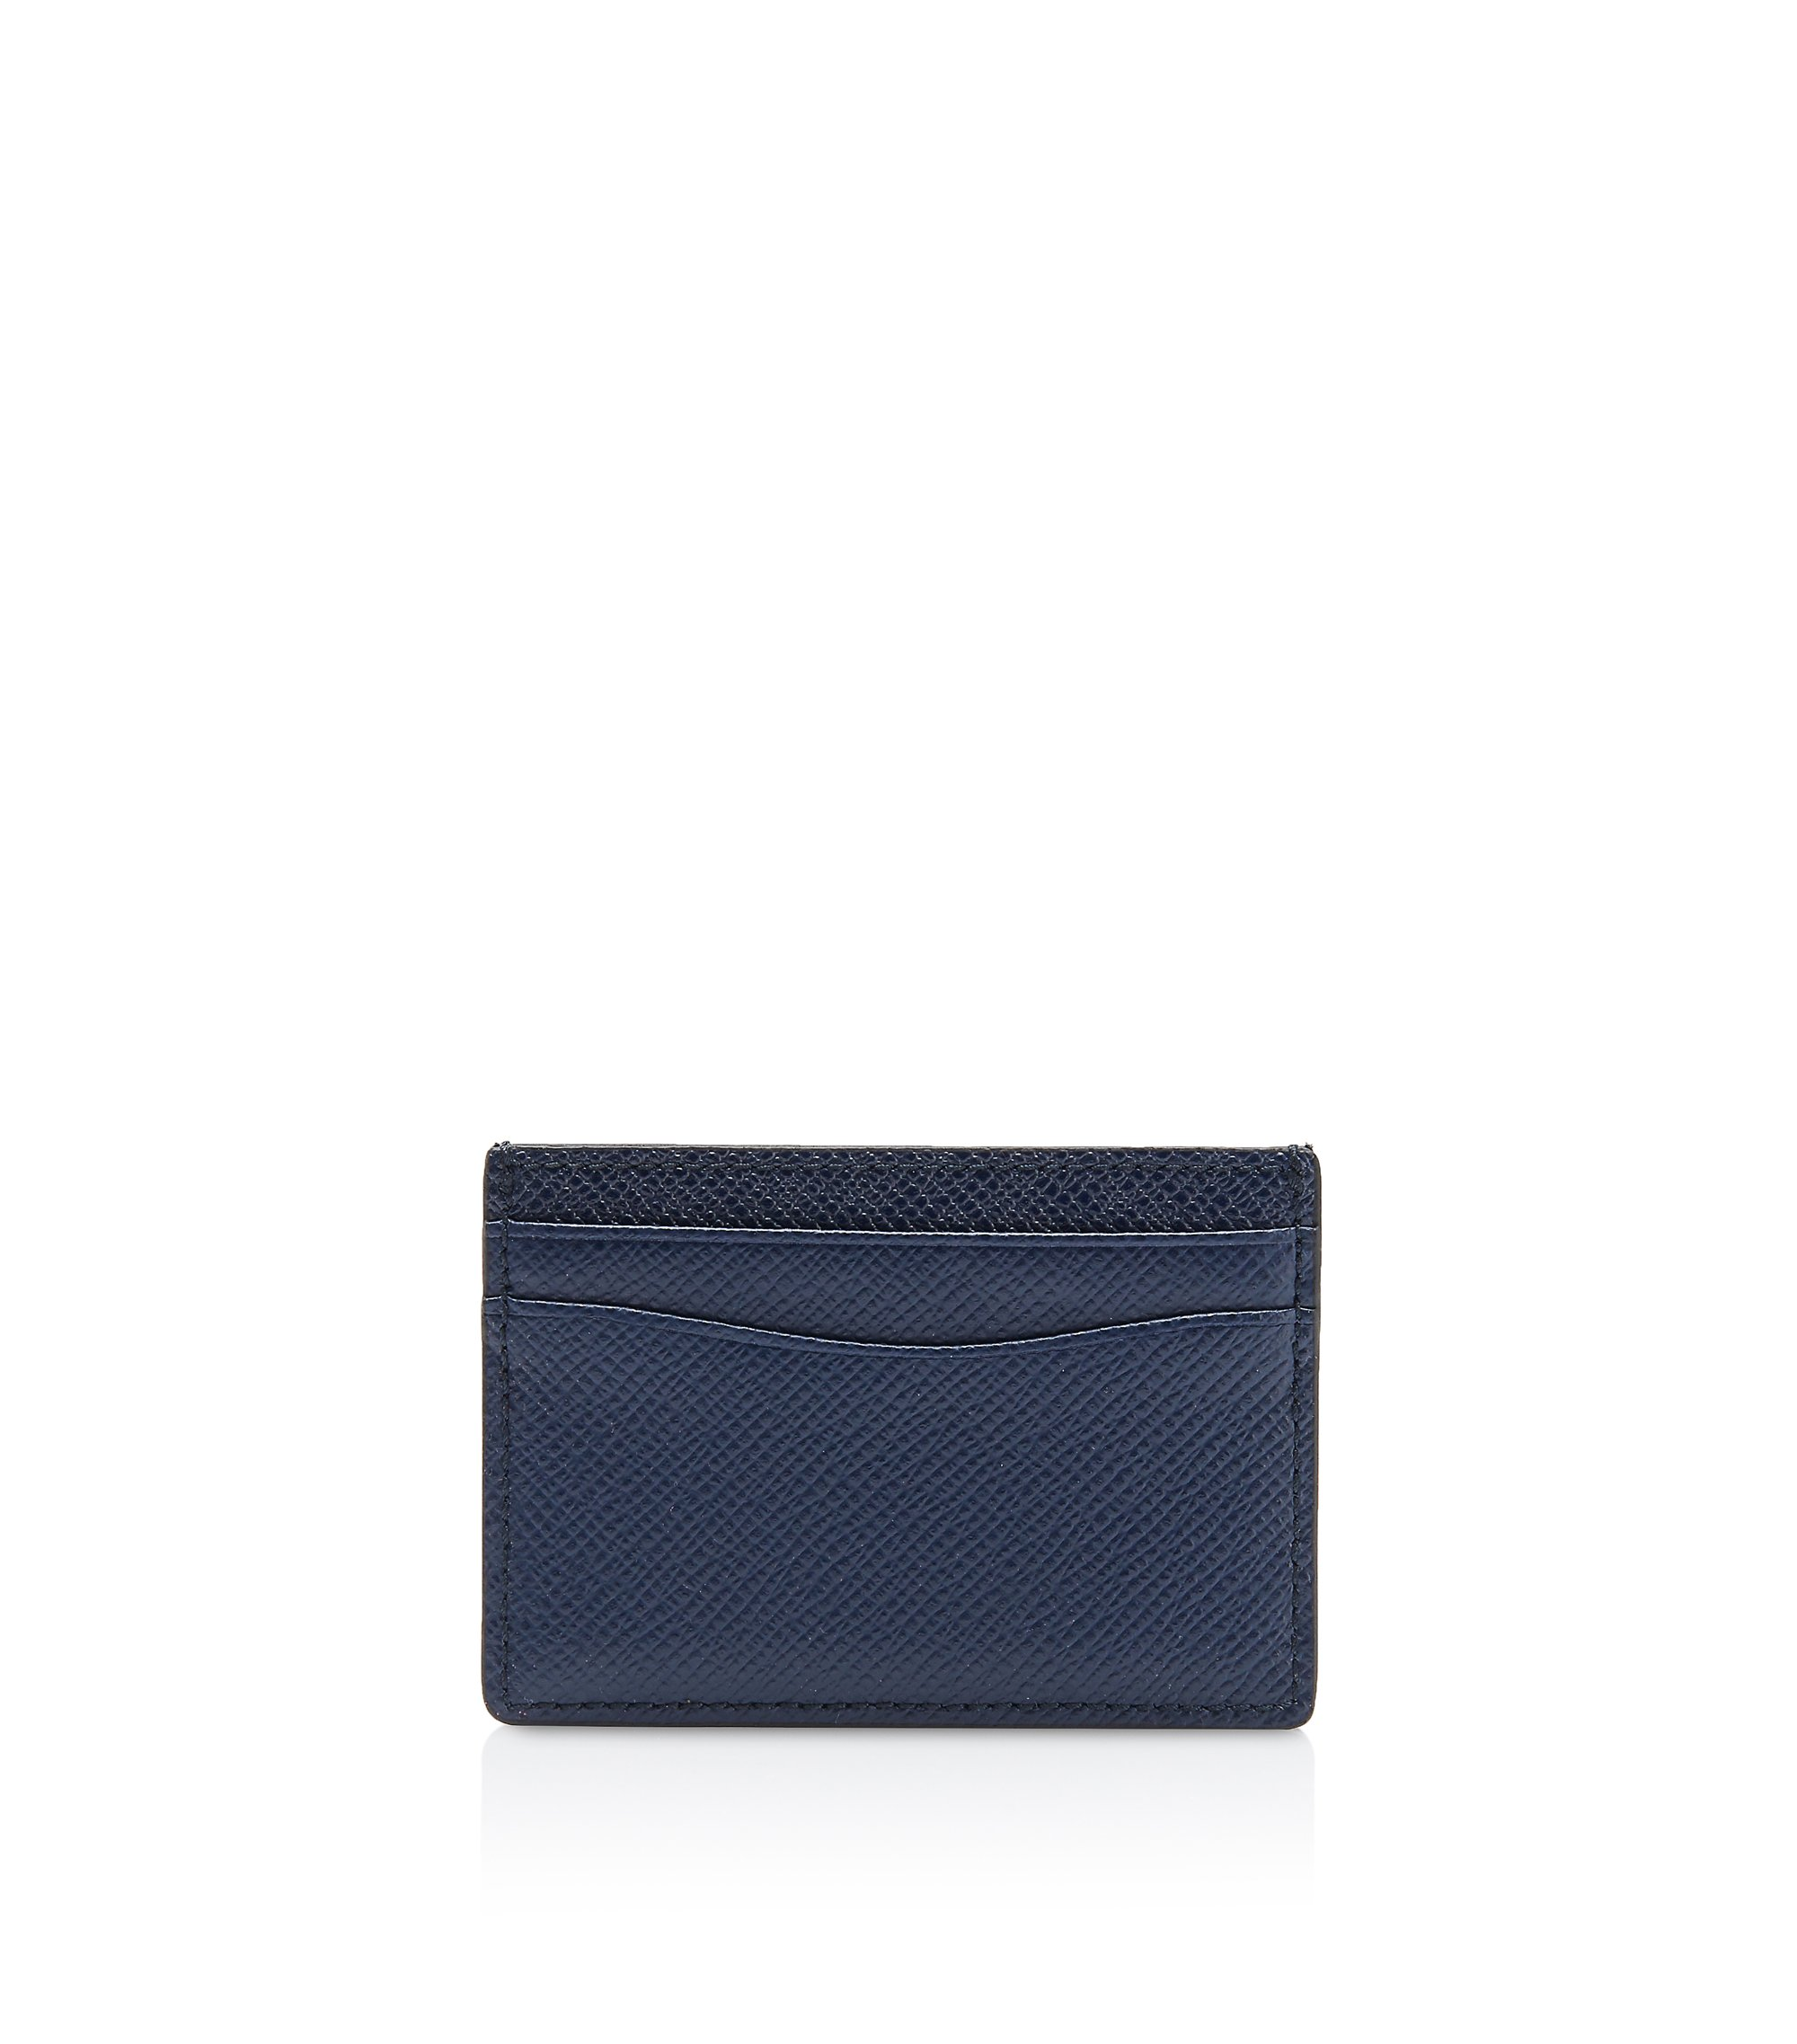 Calfskin Card Case | Signature S Card, Dark Blue